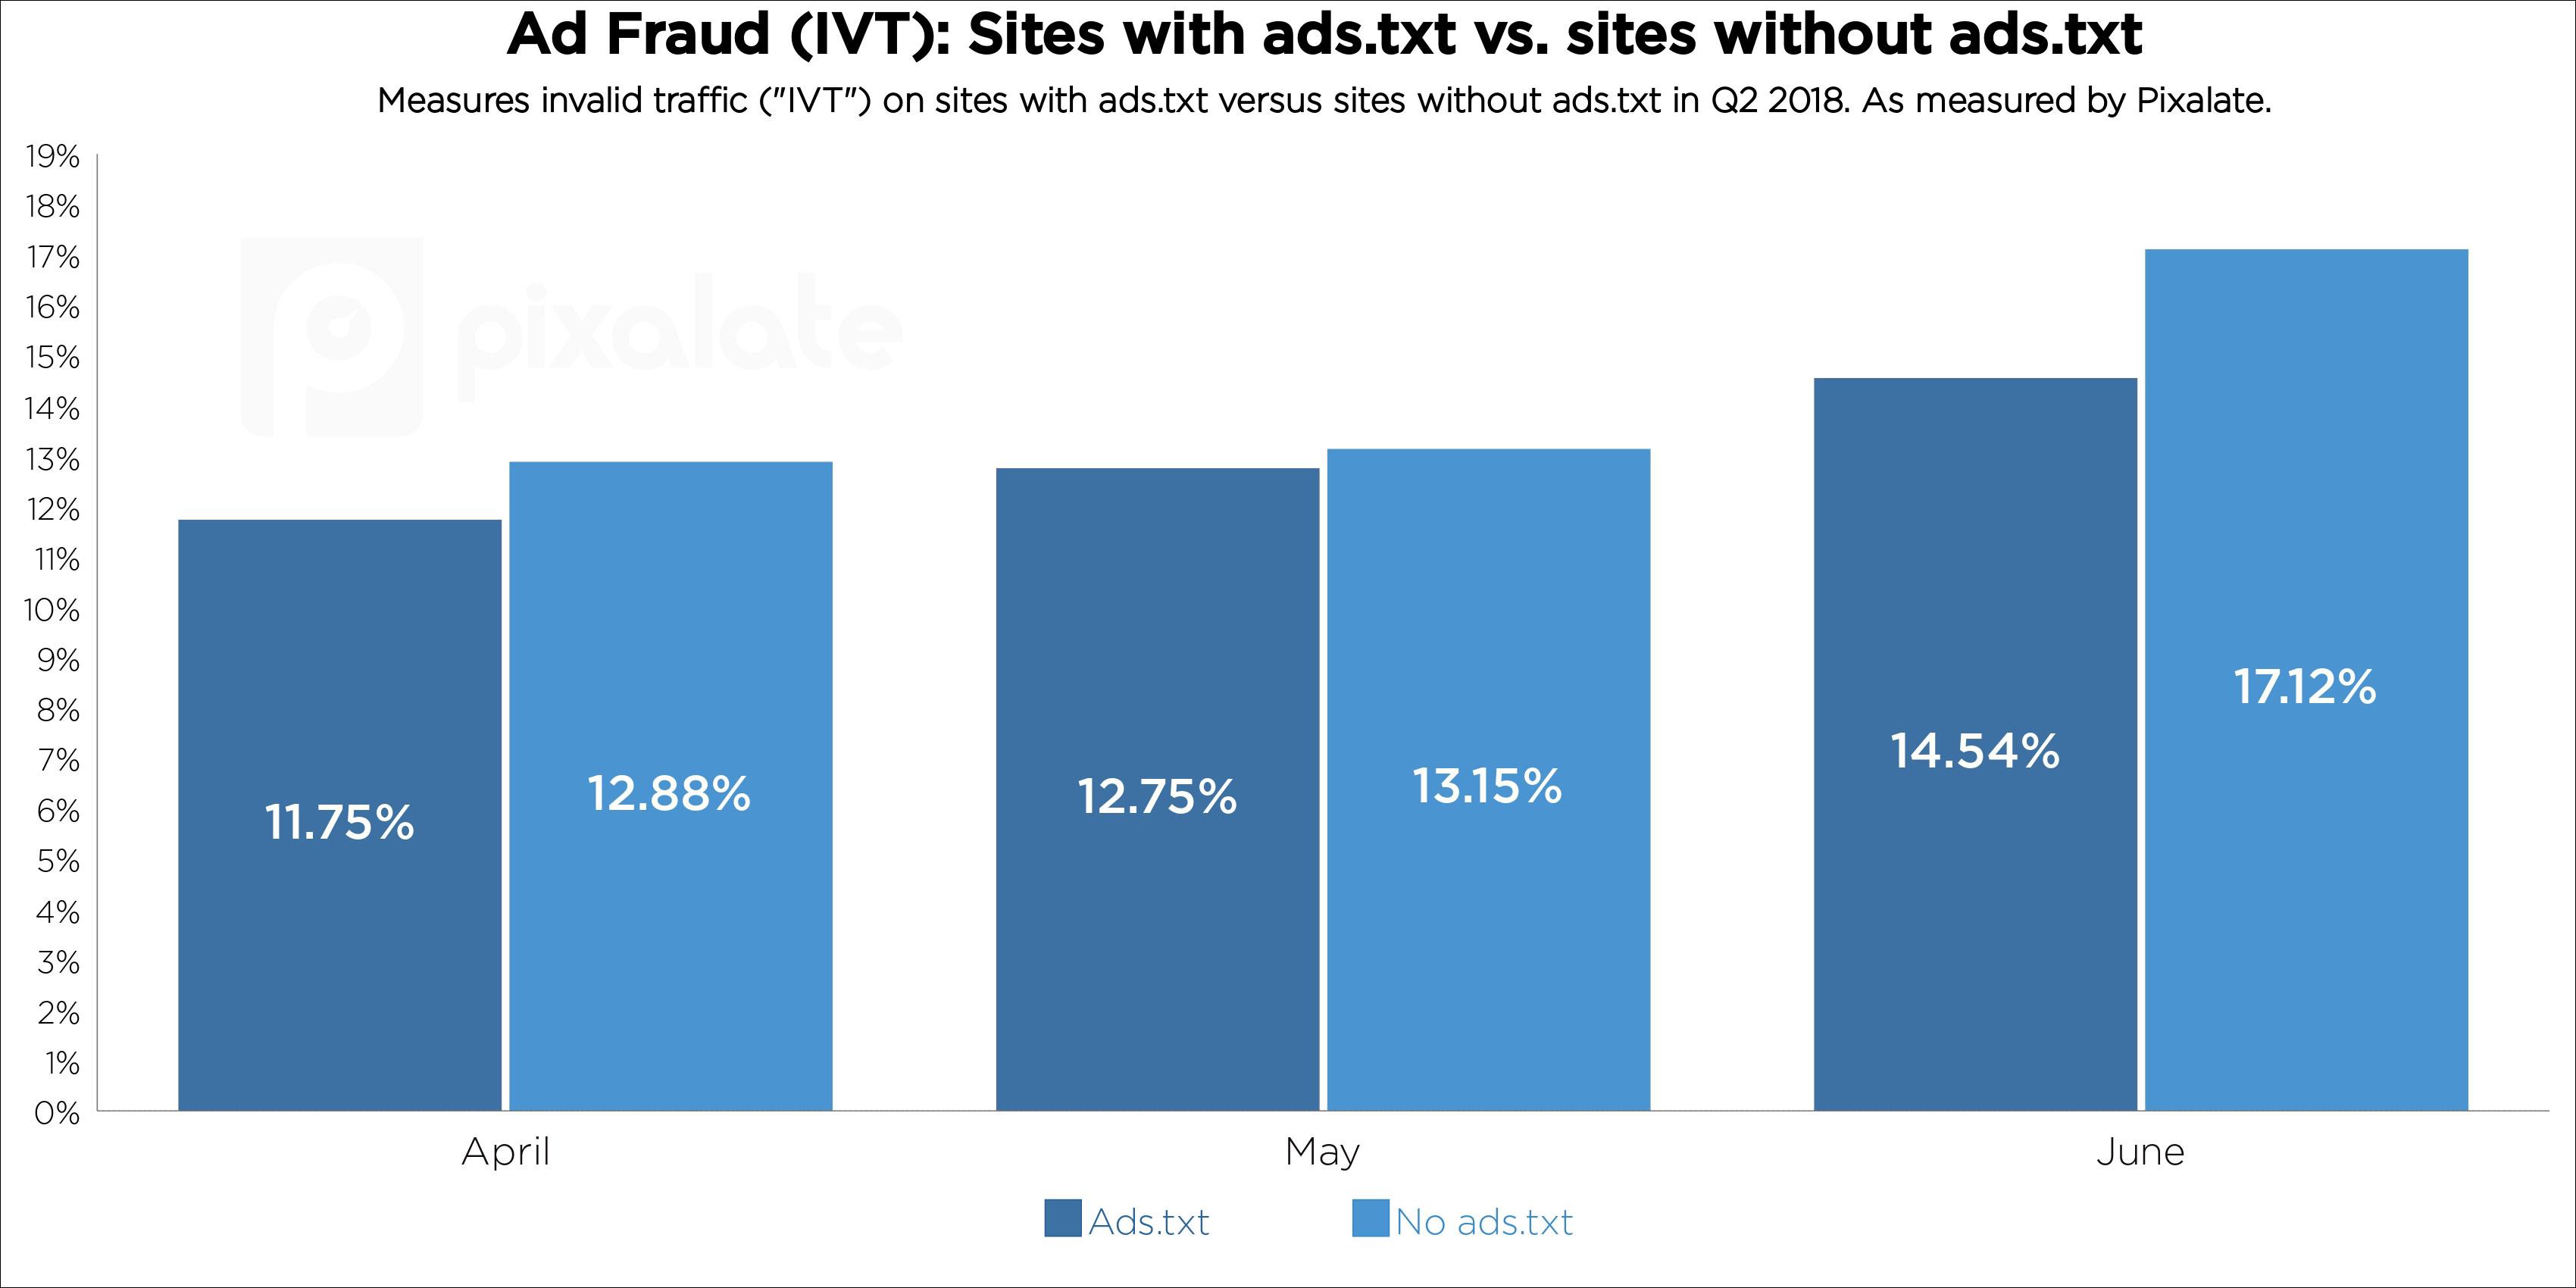 q2-2018-ads-txt-trends-ad-fraud-ivt